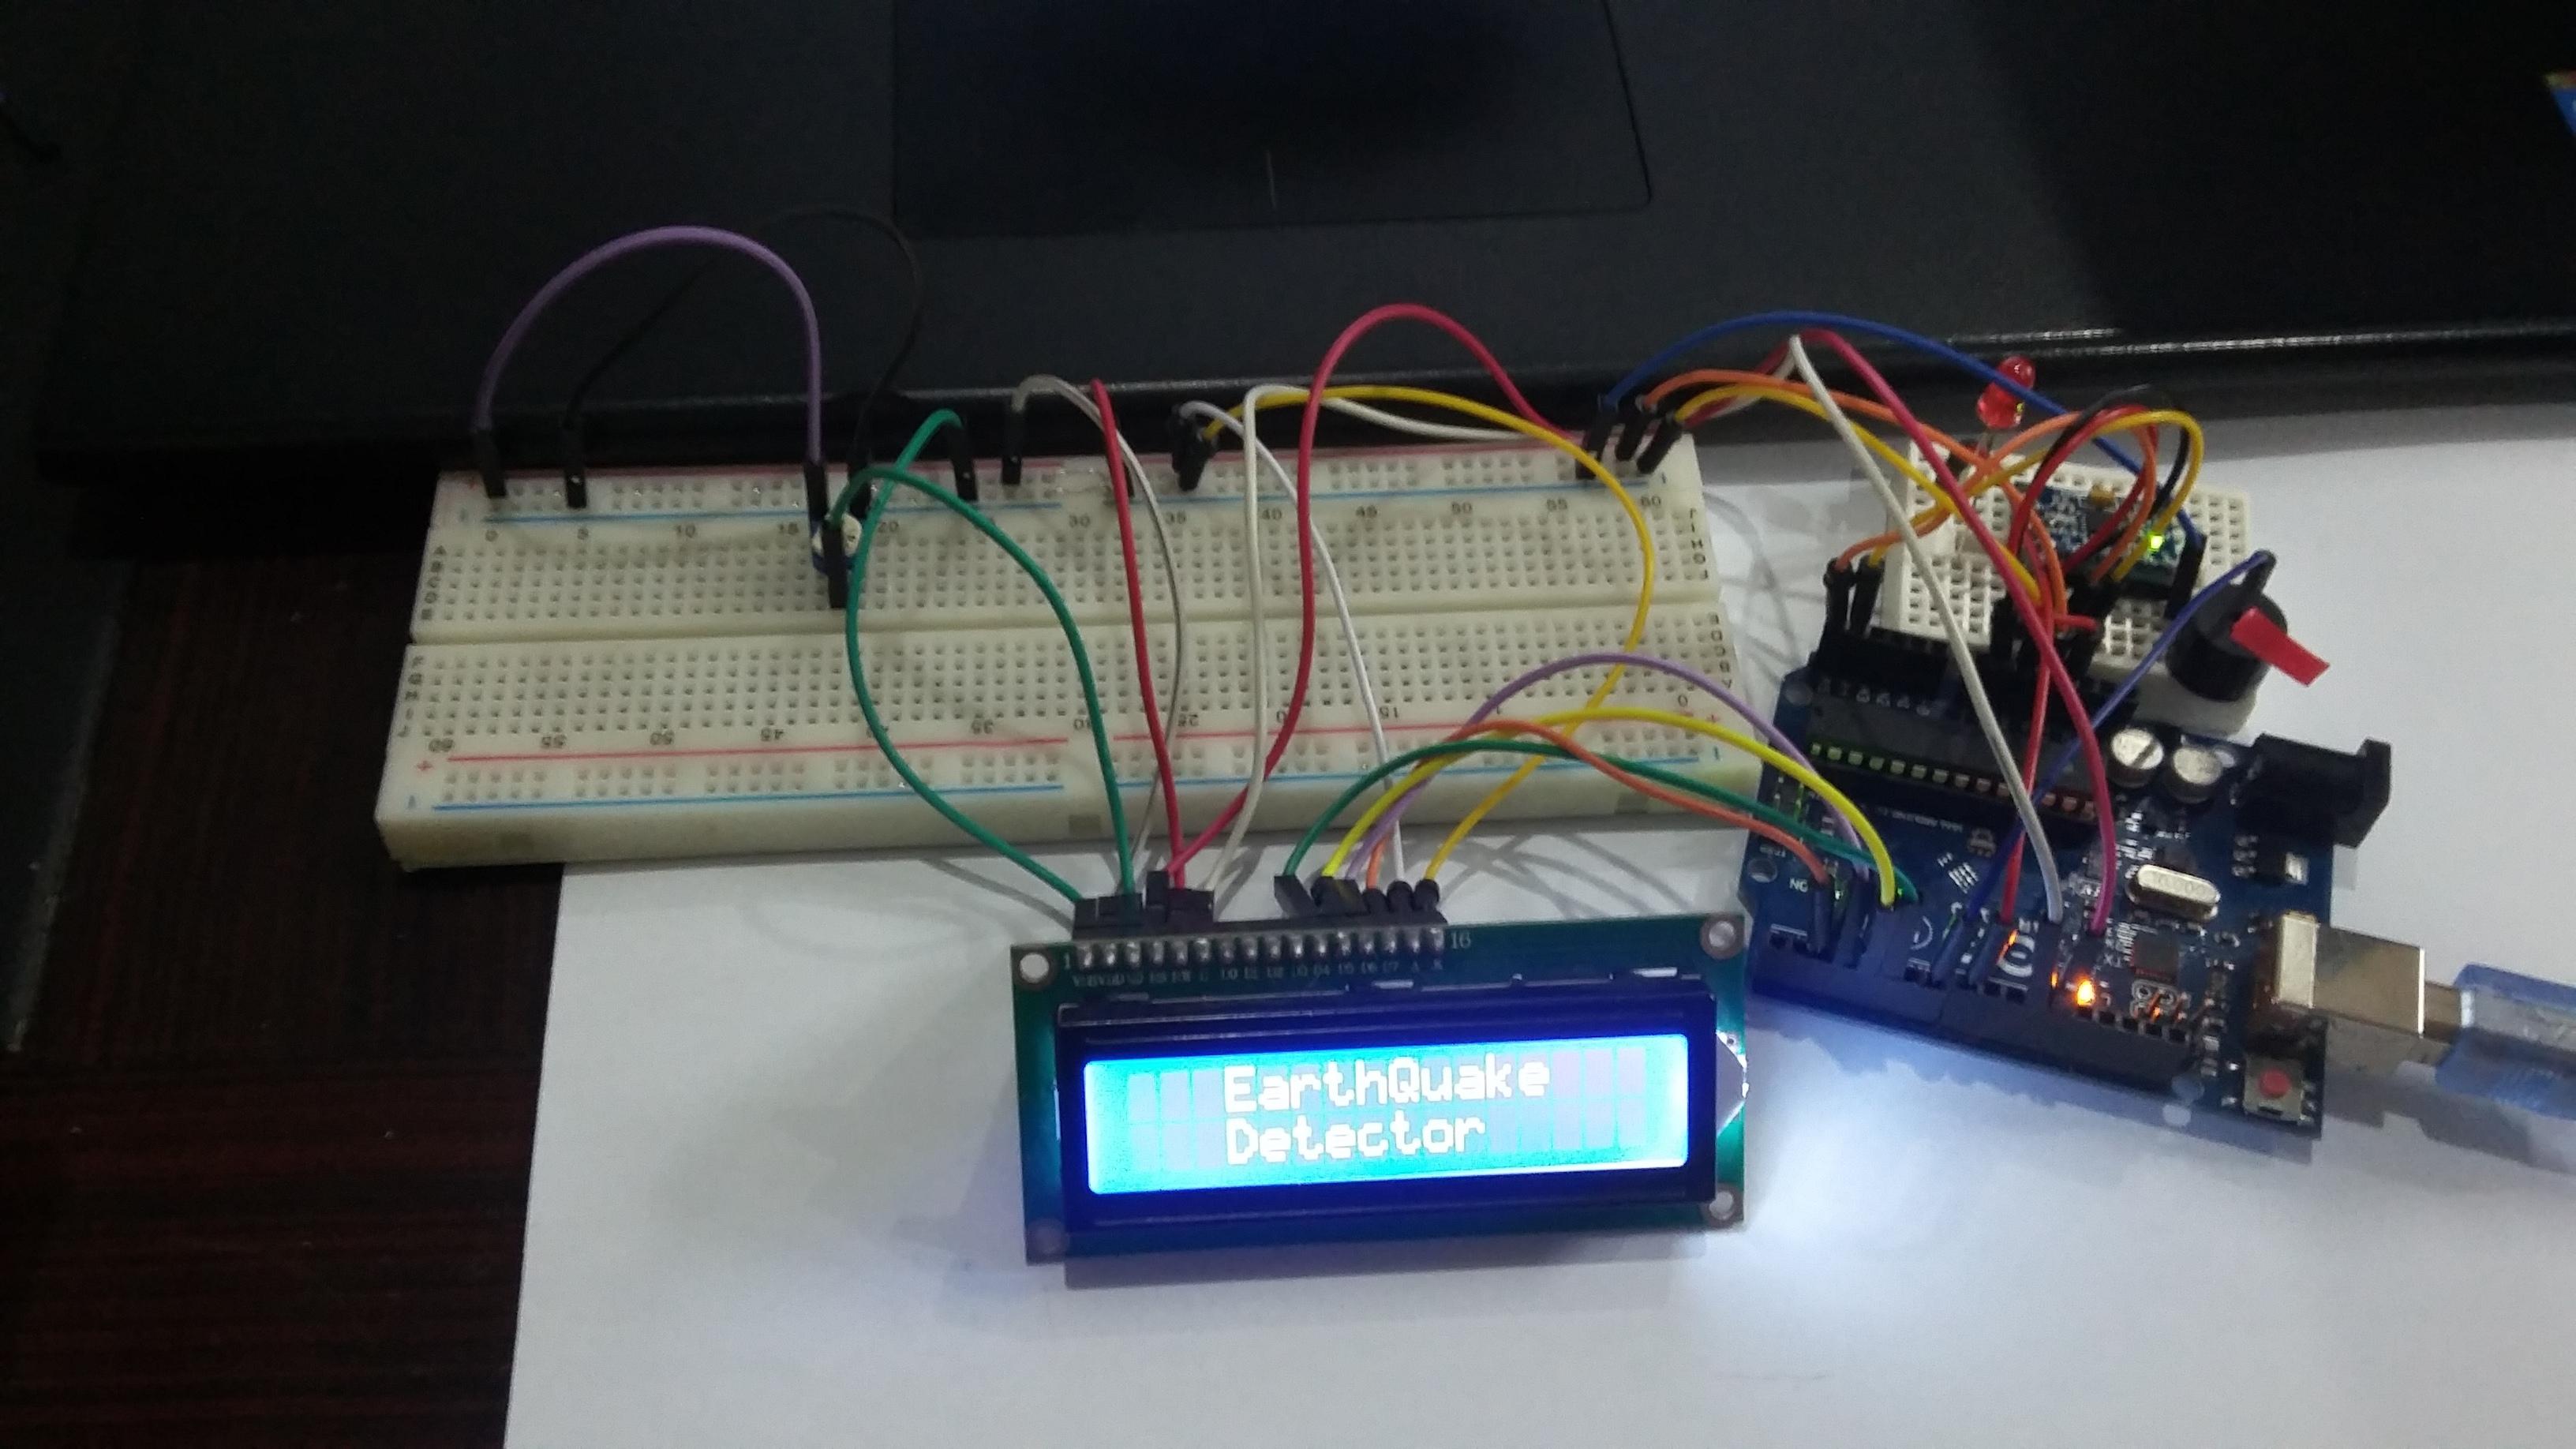 Earthquake Detector using Arduino and MPU-6050